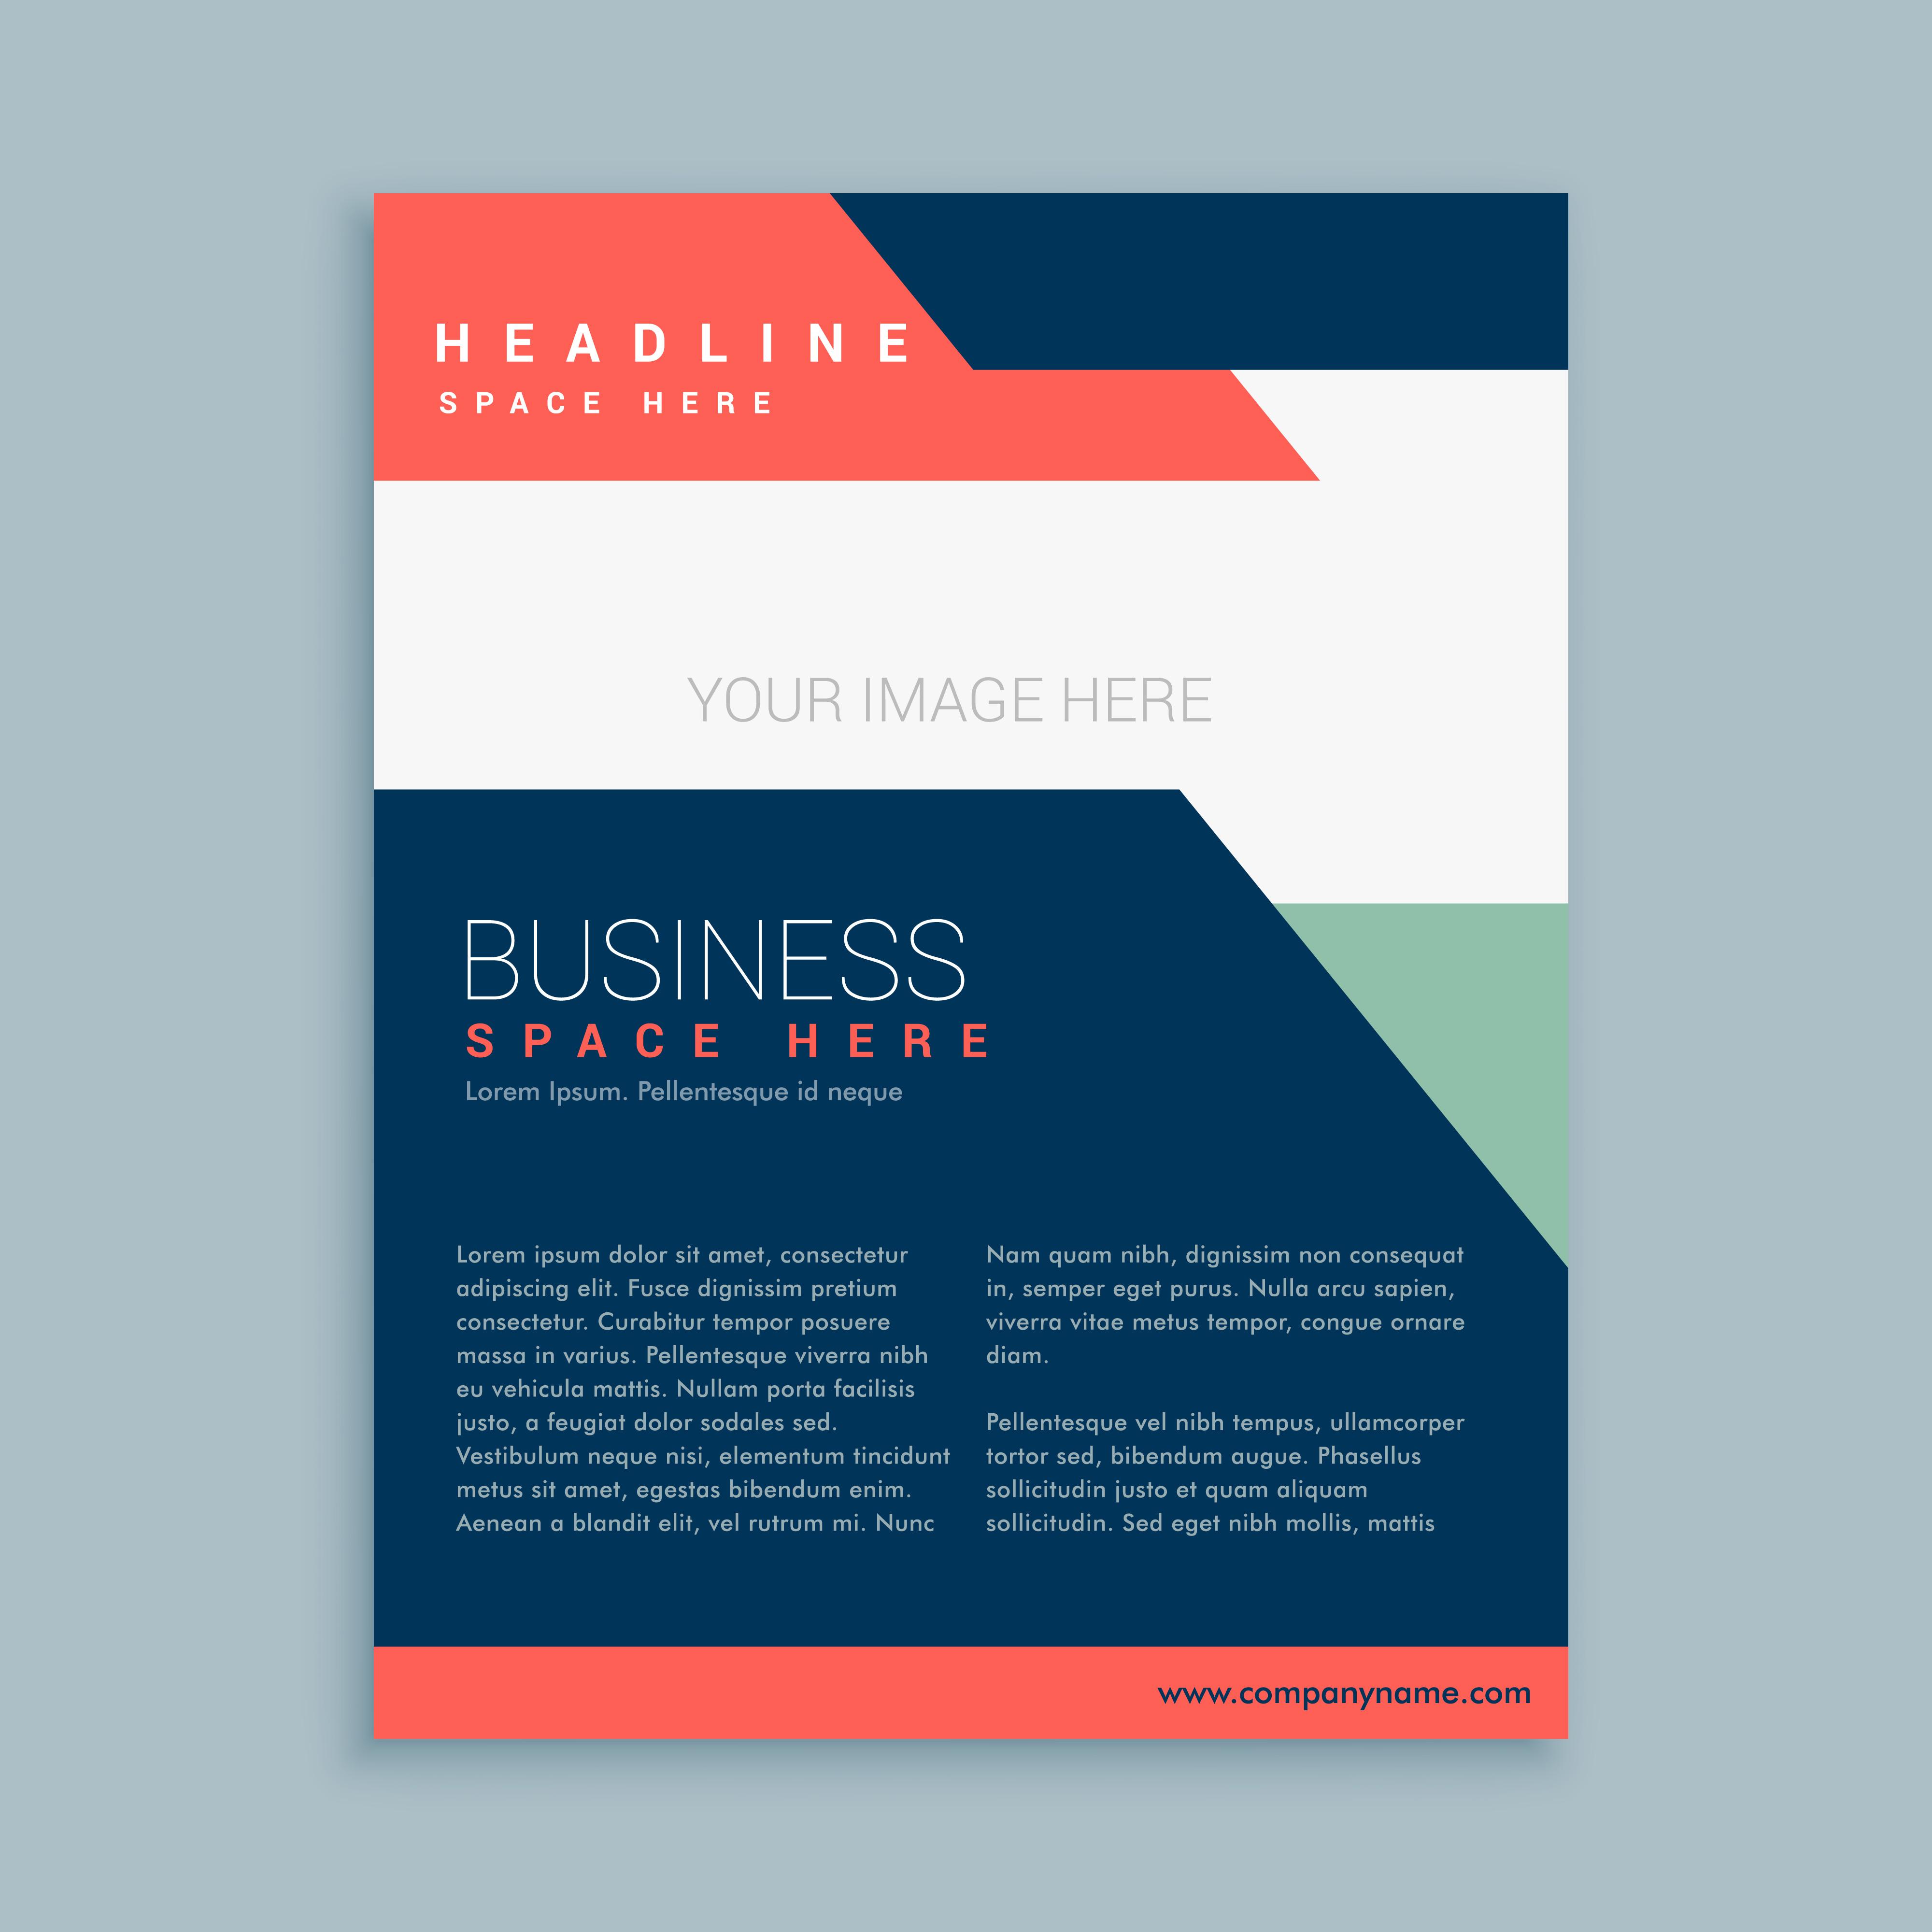 17 Corporate Brochure Design Template: Abstract Business Brochure Template Design